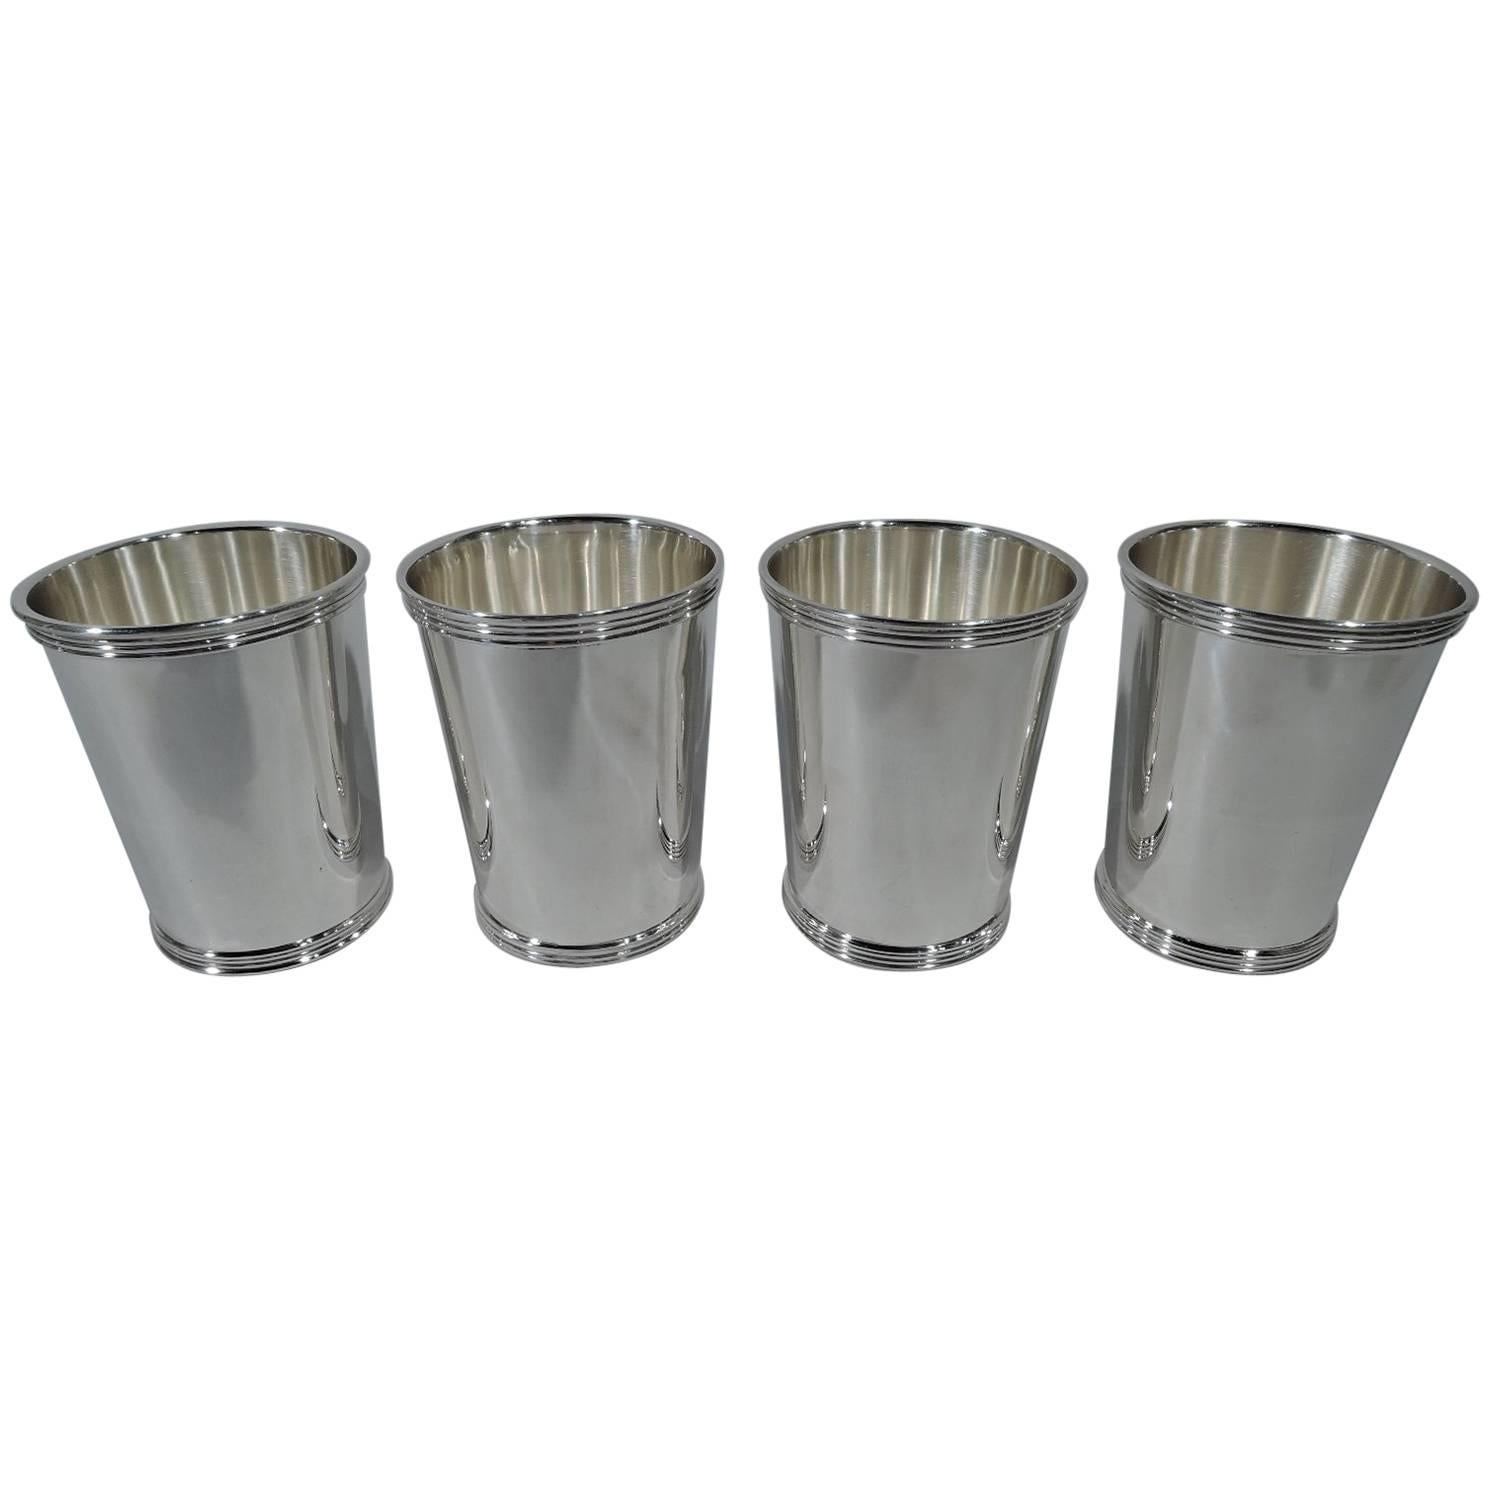 Elegant Set Of Four International Sterling Silver Mint Julep Cups